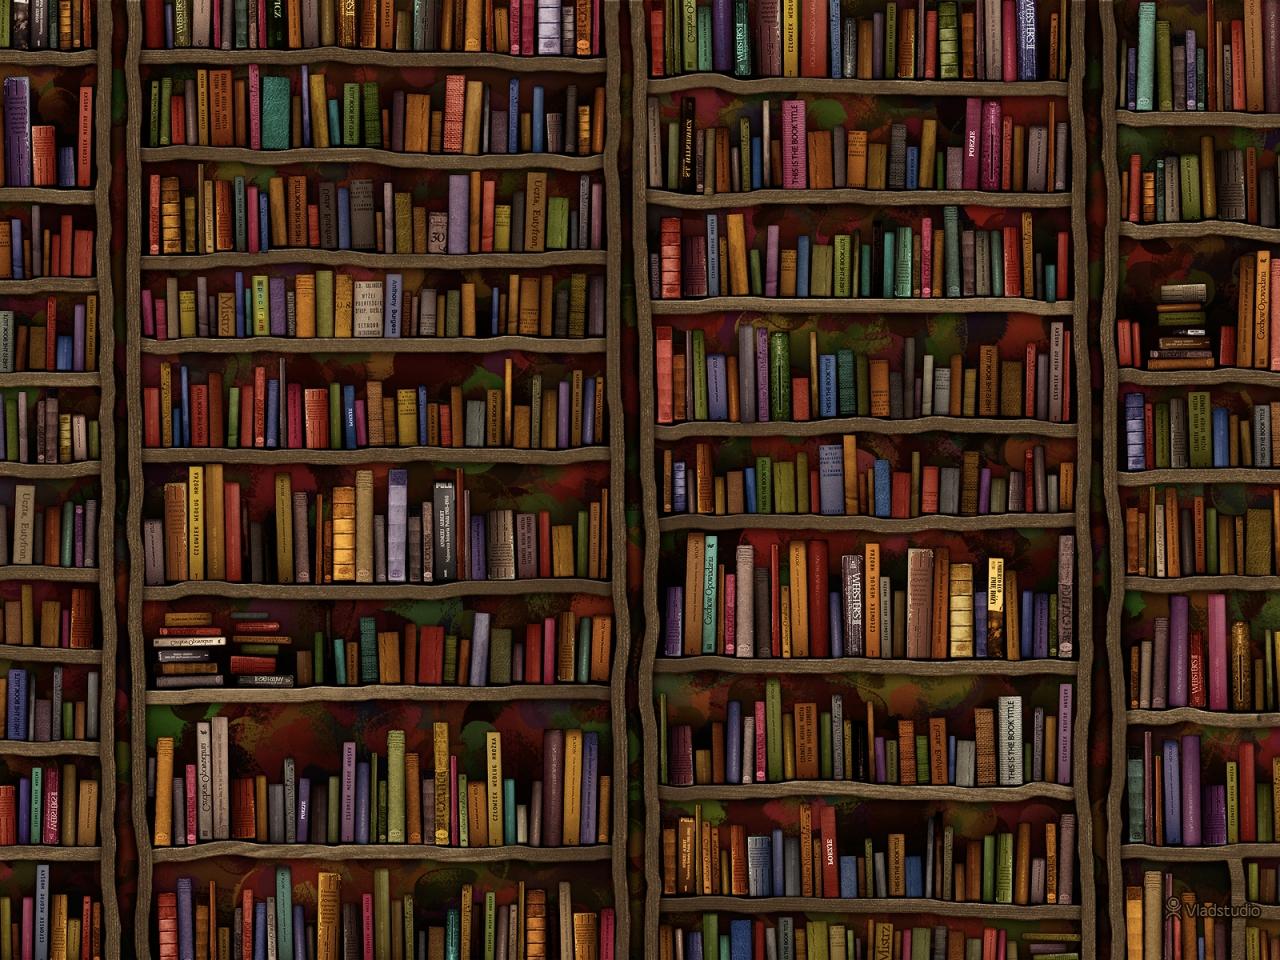 library_by_vladstudio-d5mfjau